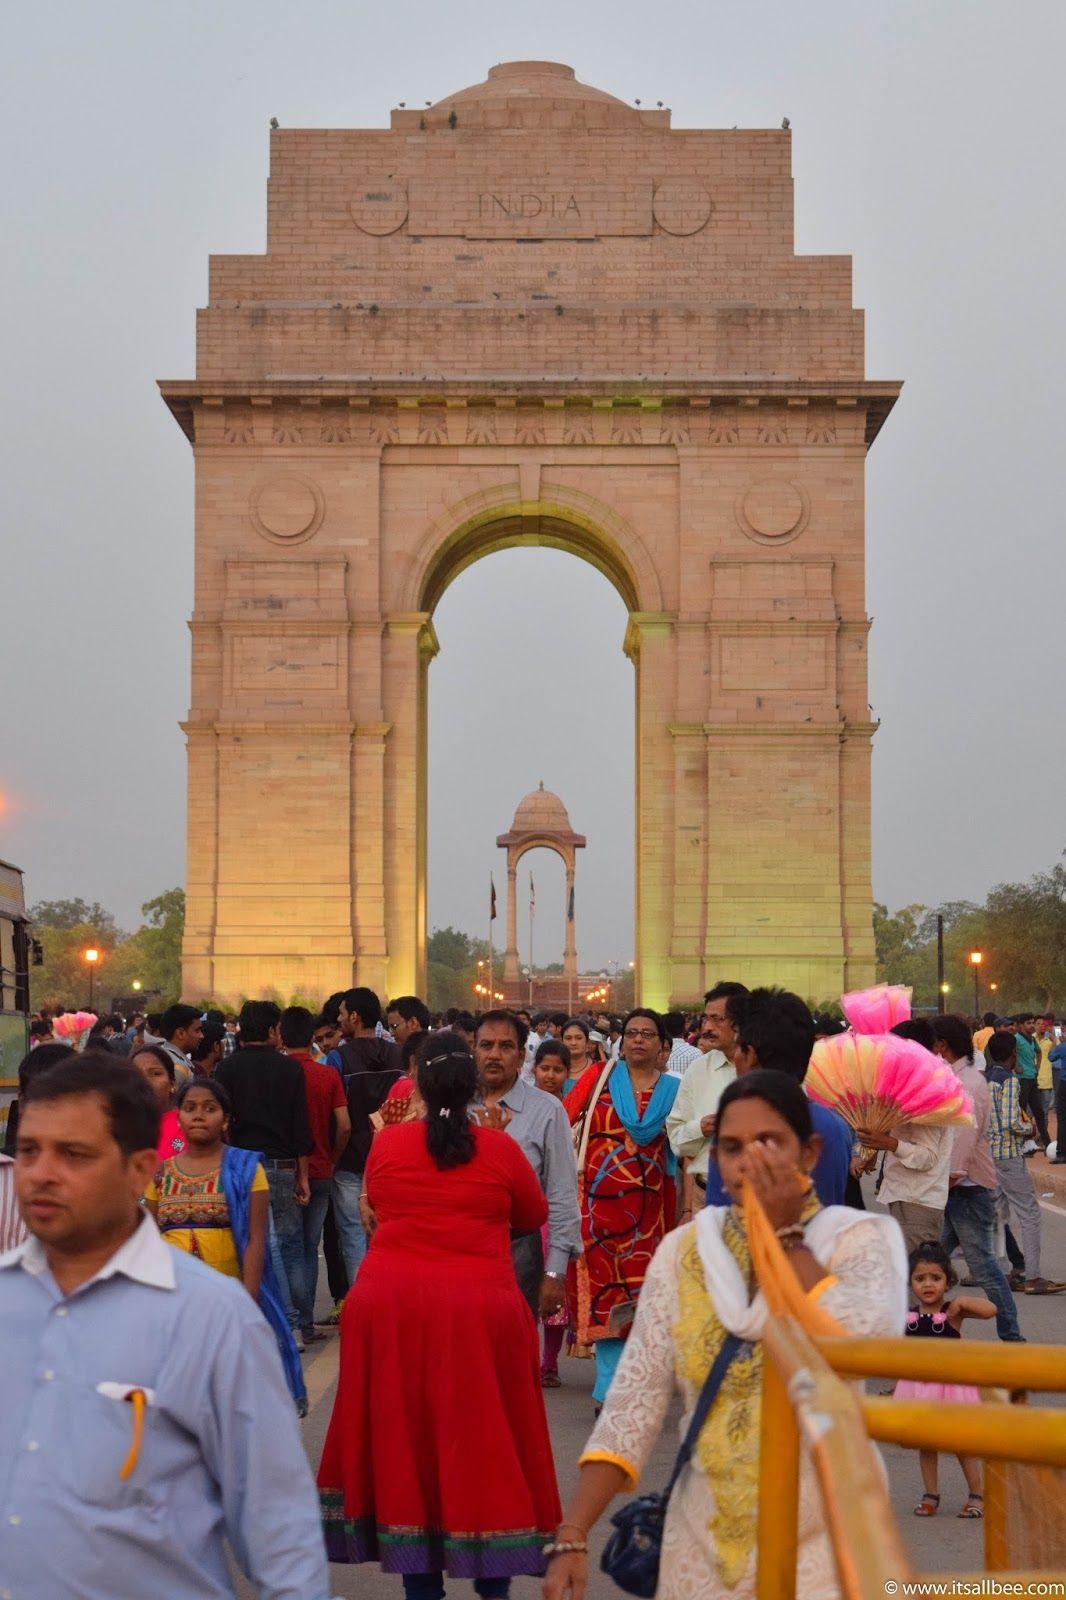 Top 13 Places To Visit In Delhi Itsallbee Solo Travel Adventure Tips Visit India Delhi Taj Mahal Delhi